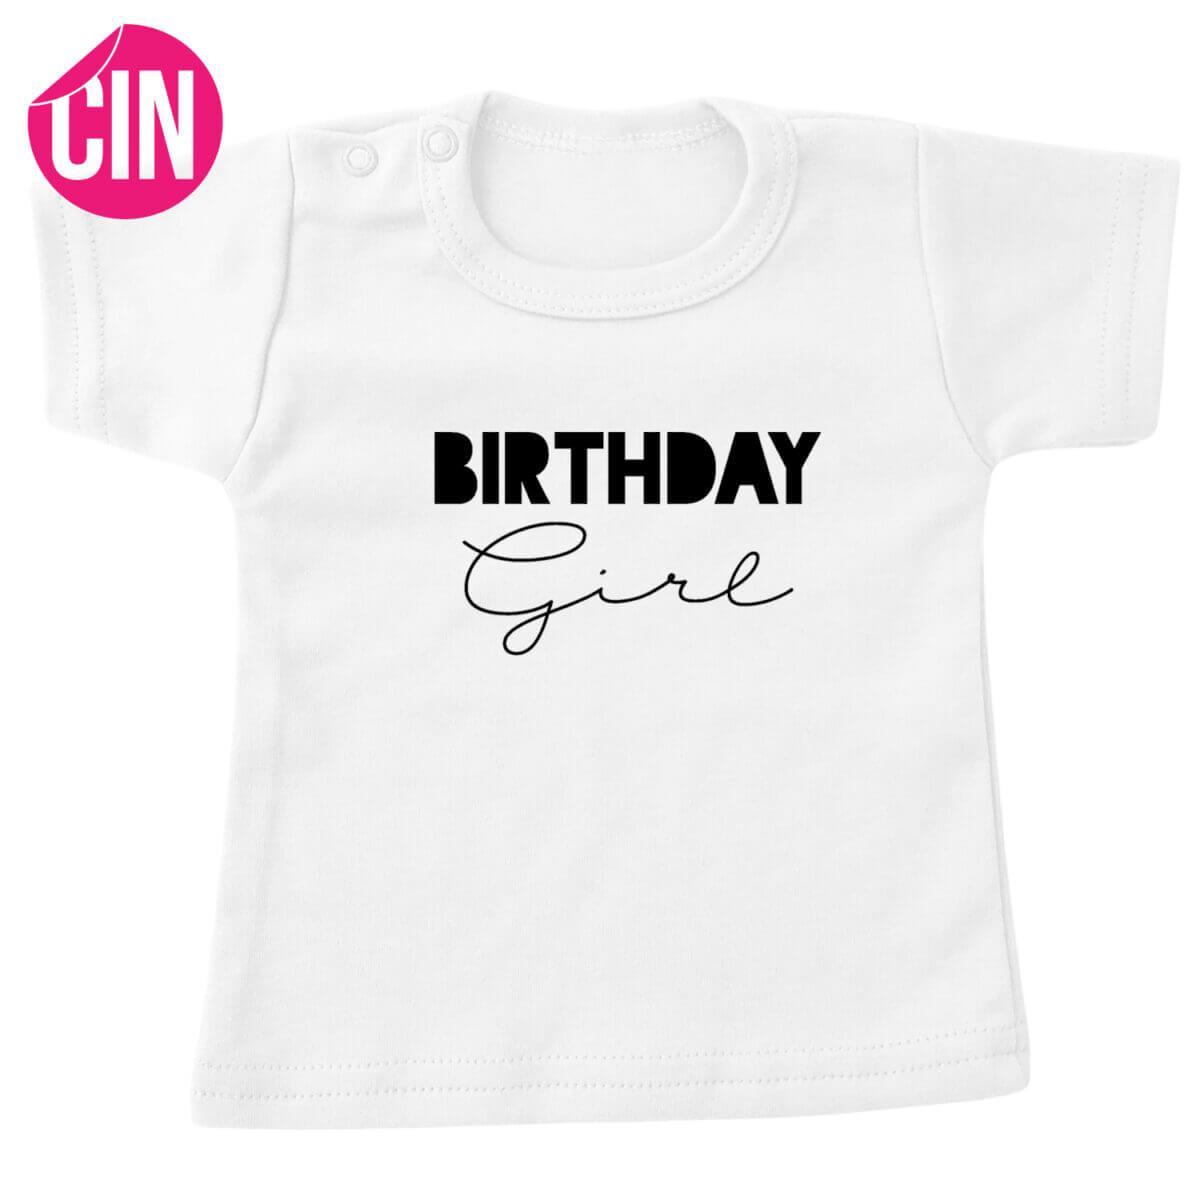 birthday girl t-shirt wit cindysigns